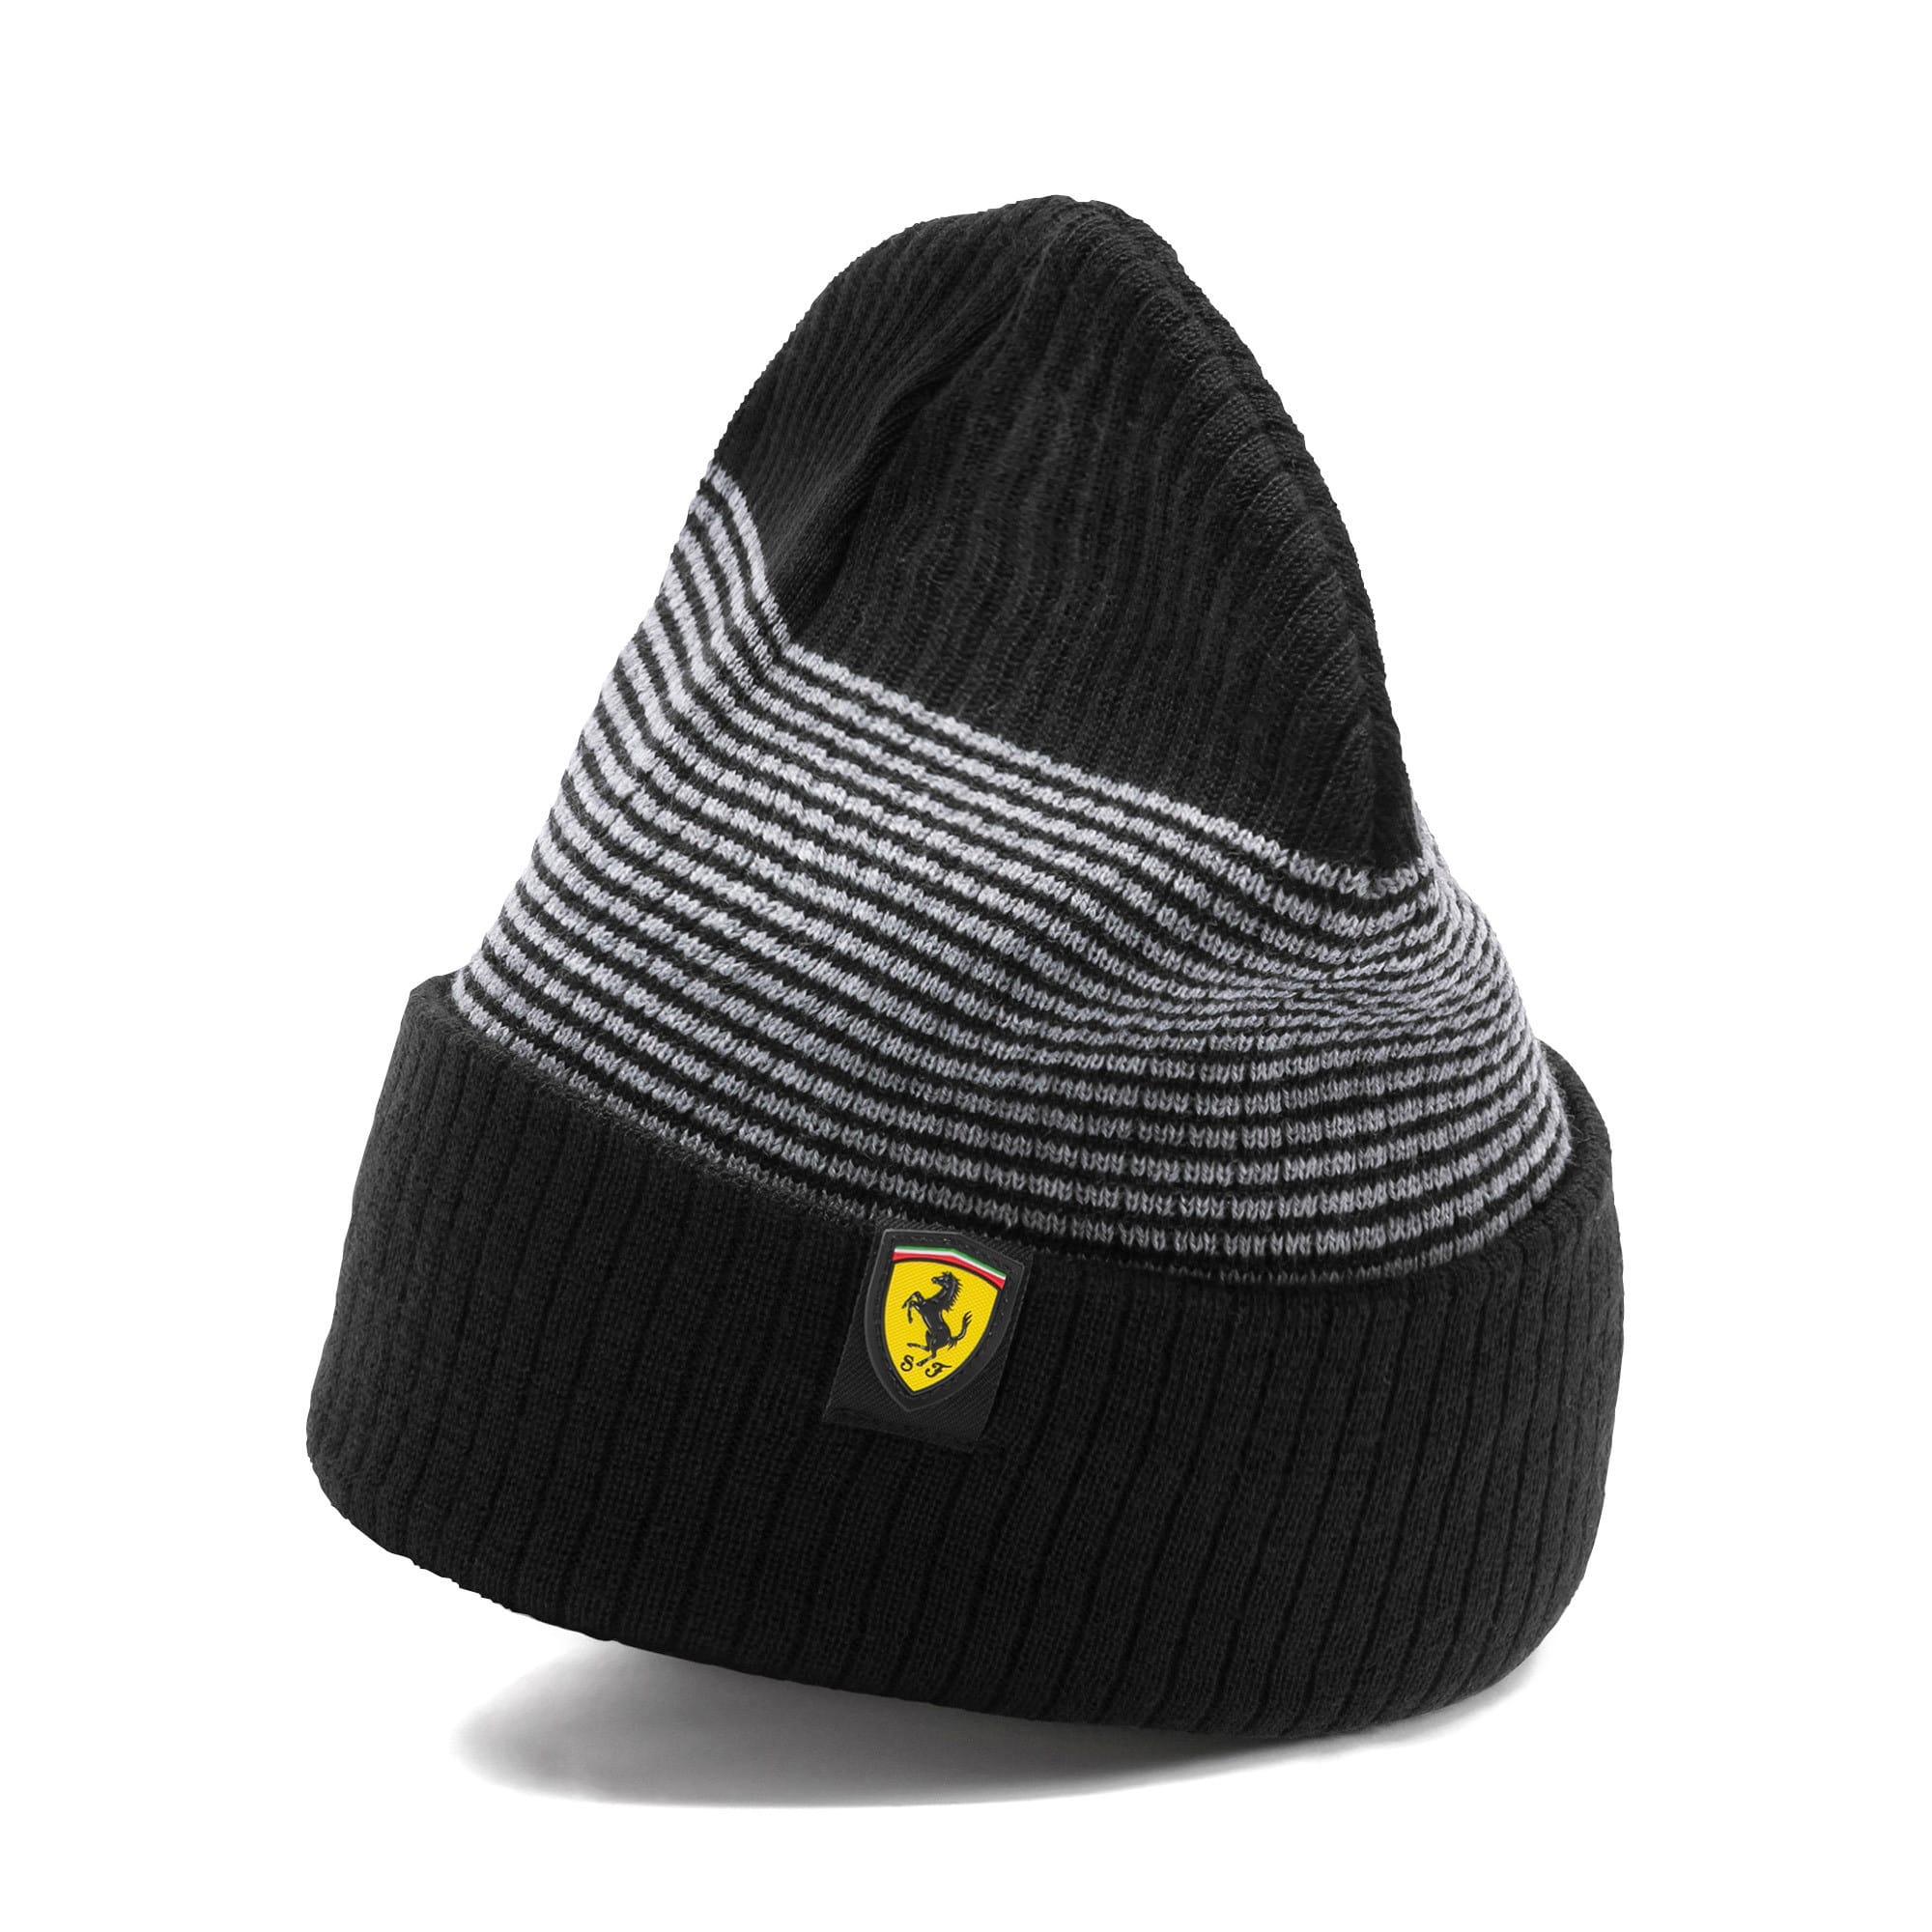 Thumbnail 1 of Ferrari Fanwear Beanie, Puma Black, medium-IND